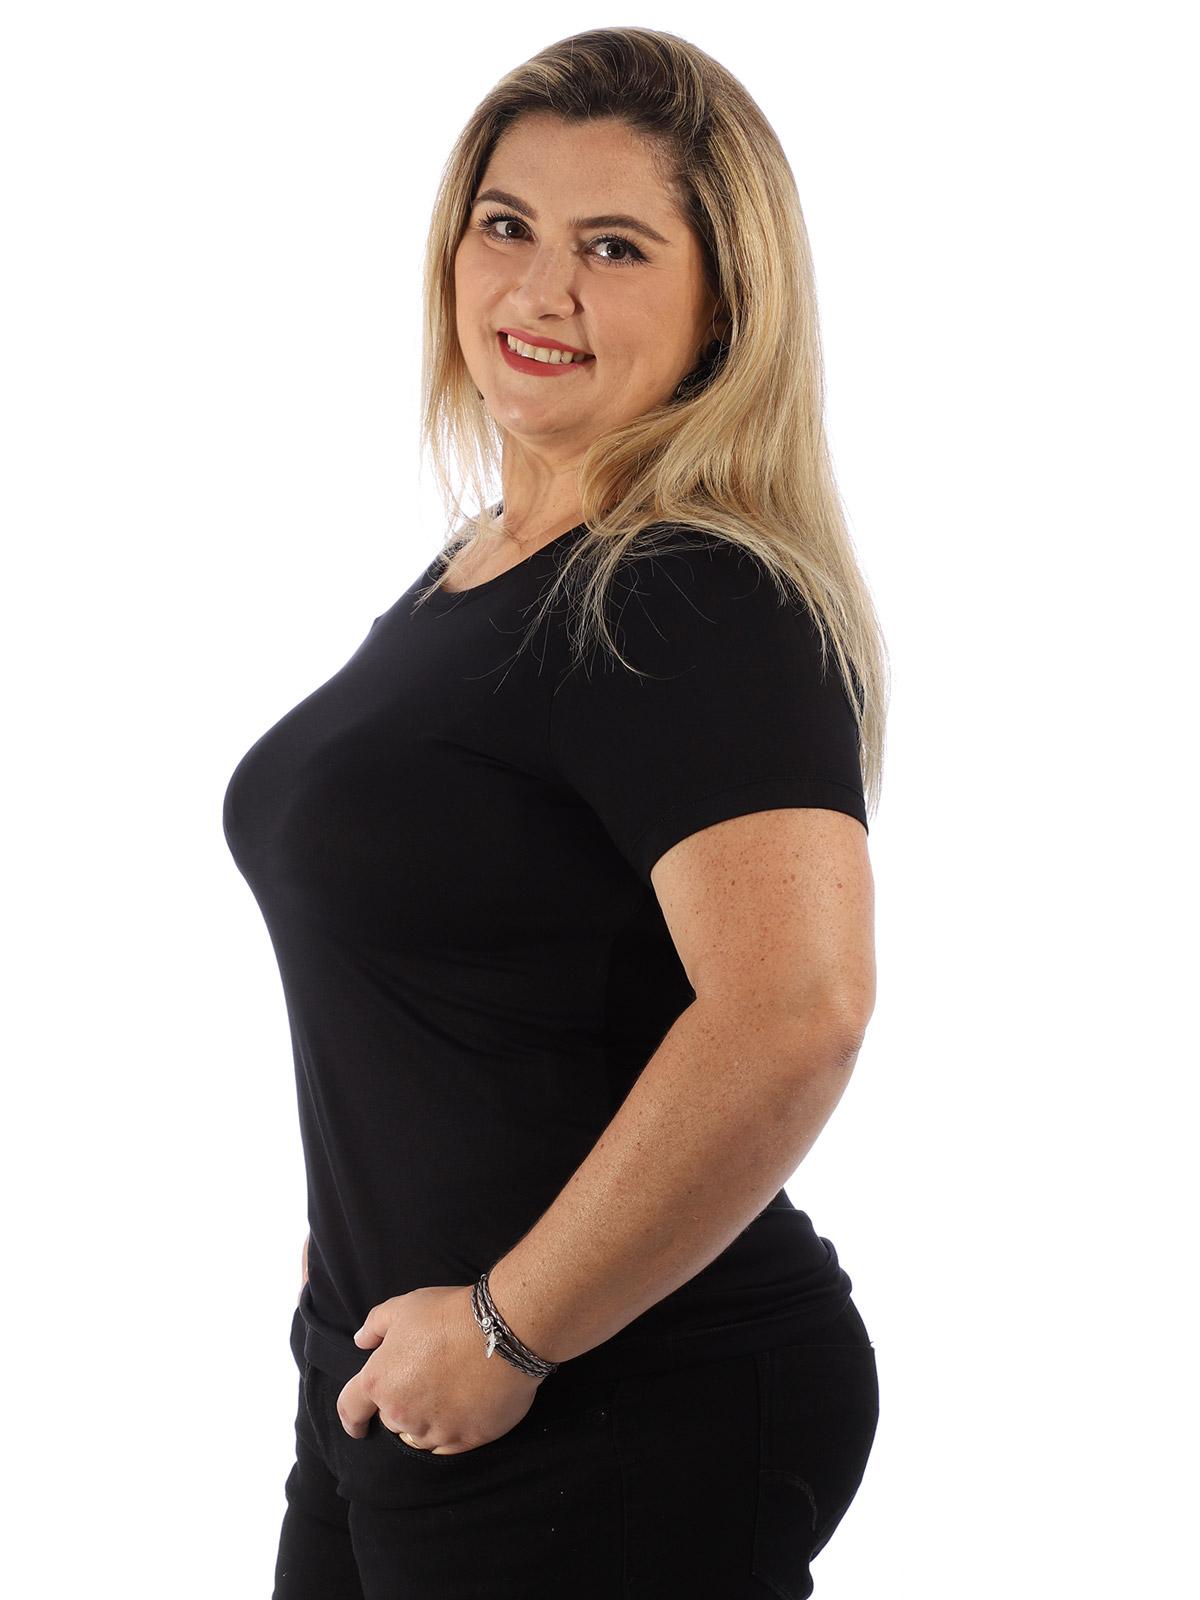 Blusa Plus Size Feminina Viscolycra Decote Redondo Preto